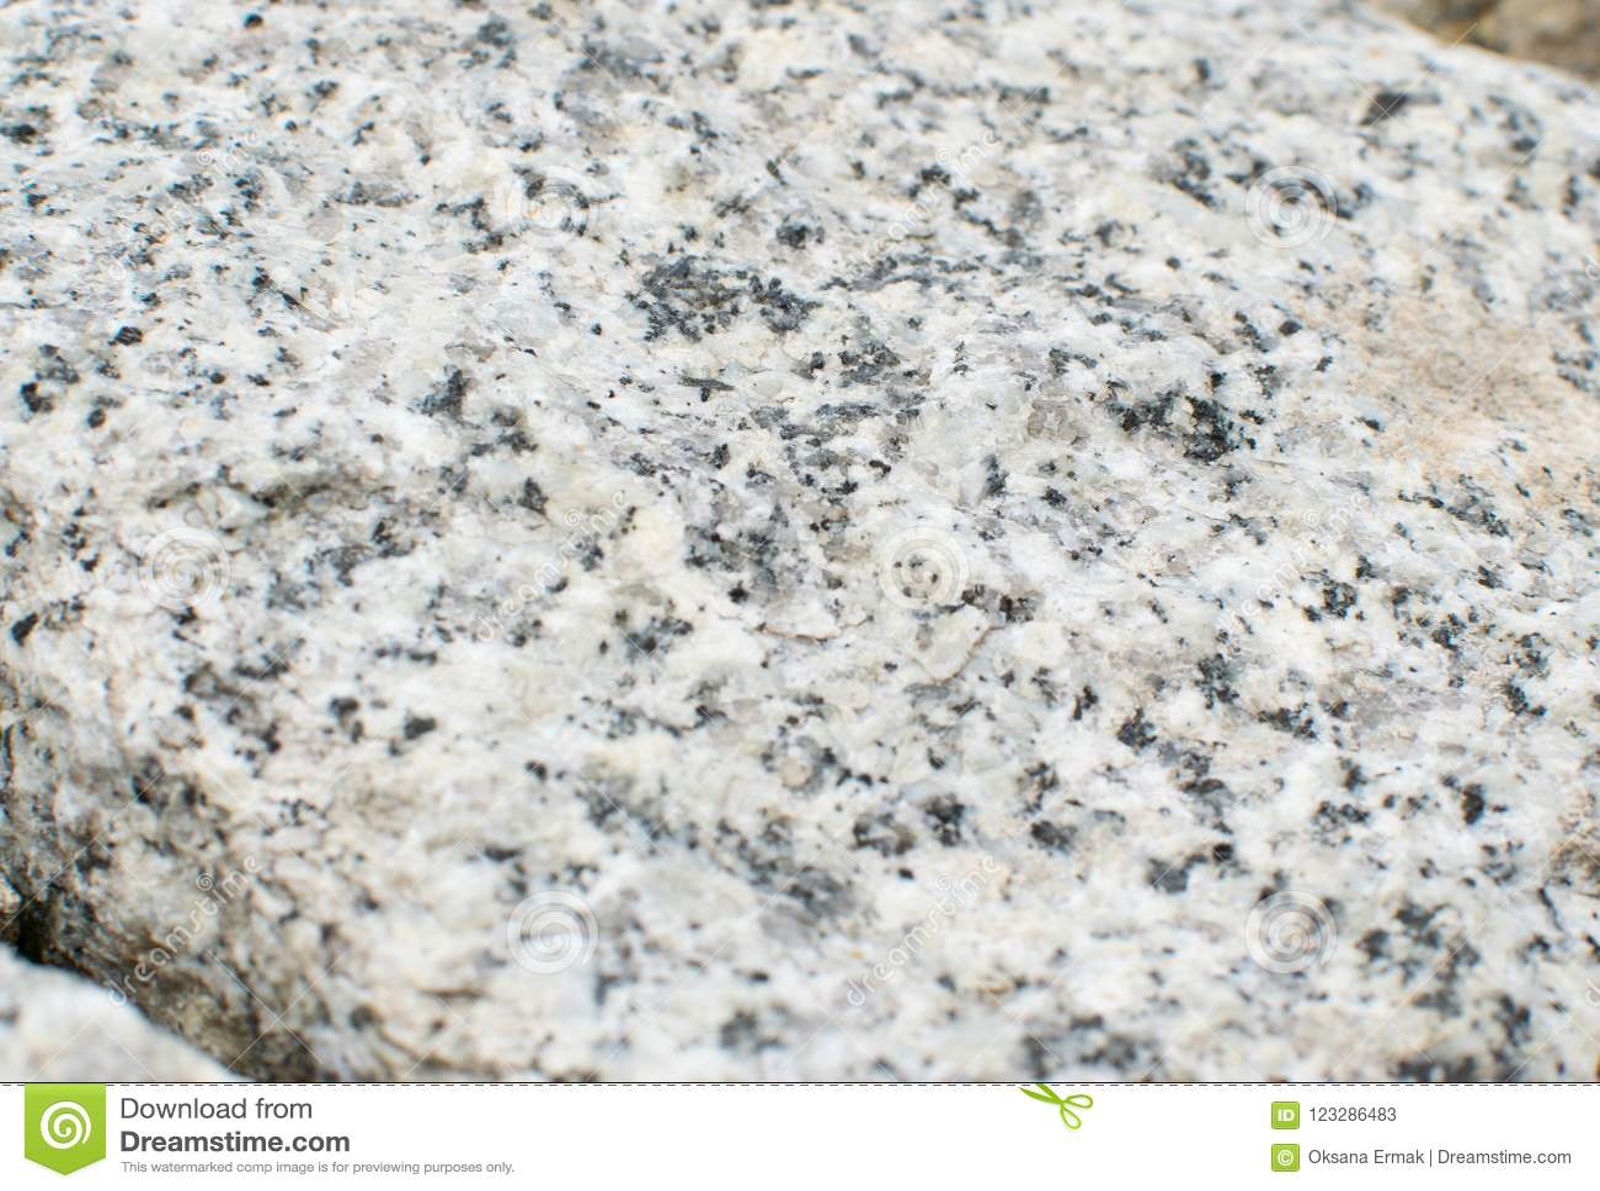 Gray Granite Rock Stone Background Stock Image - Image of